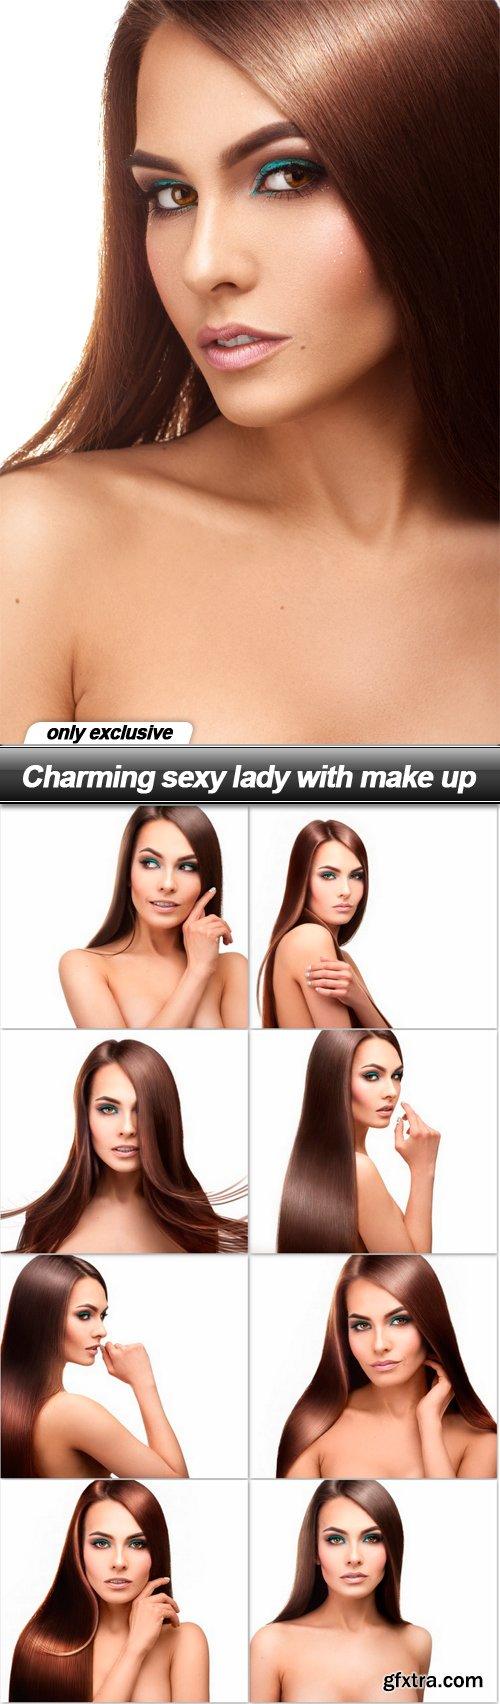 Charming sexy lady with make up - 9 UHQ JPEG